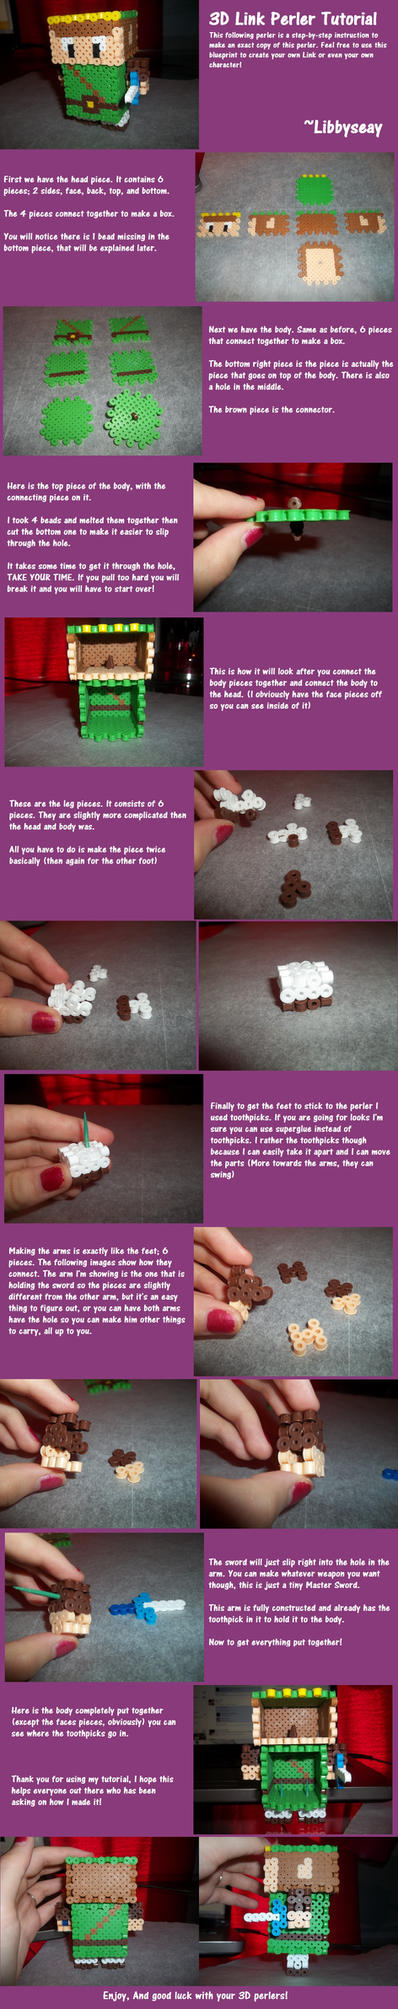 3D Link Perler Tutorial by Libbyseay